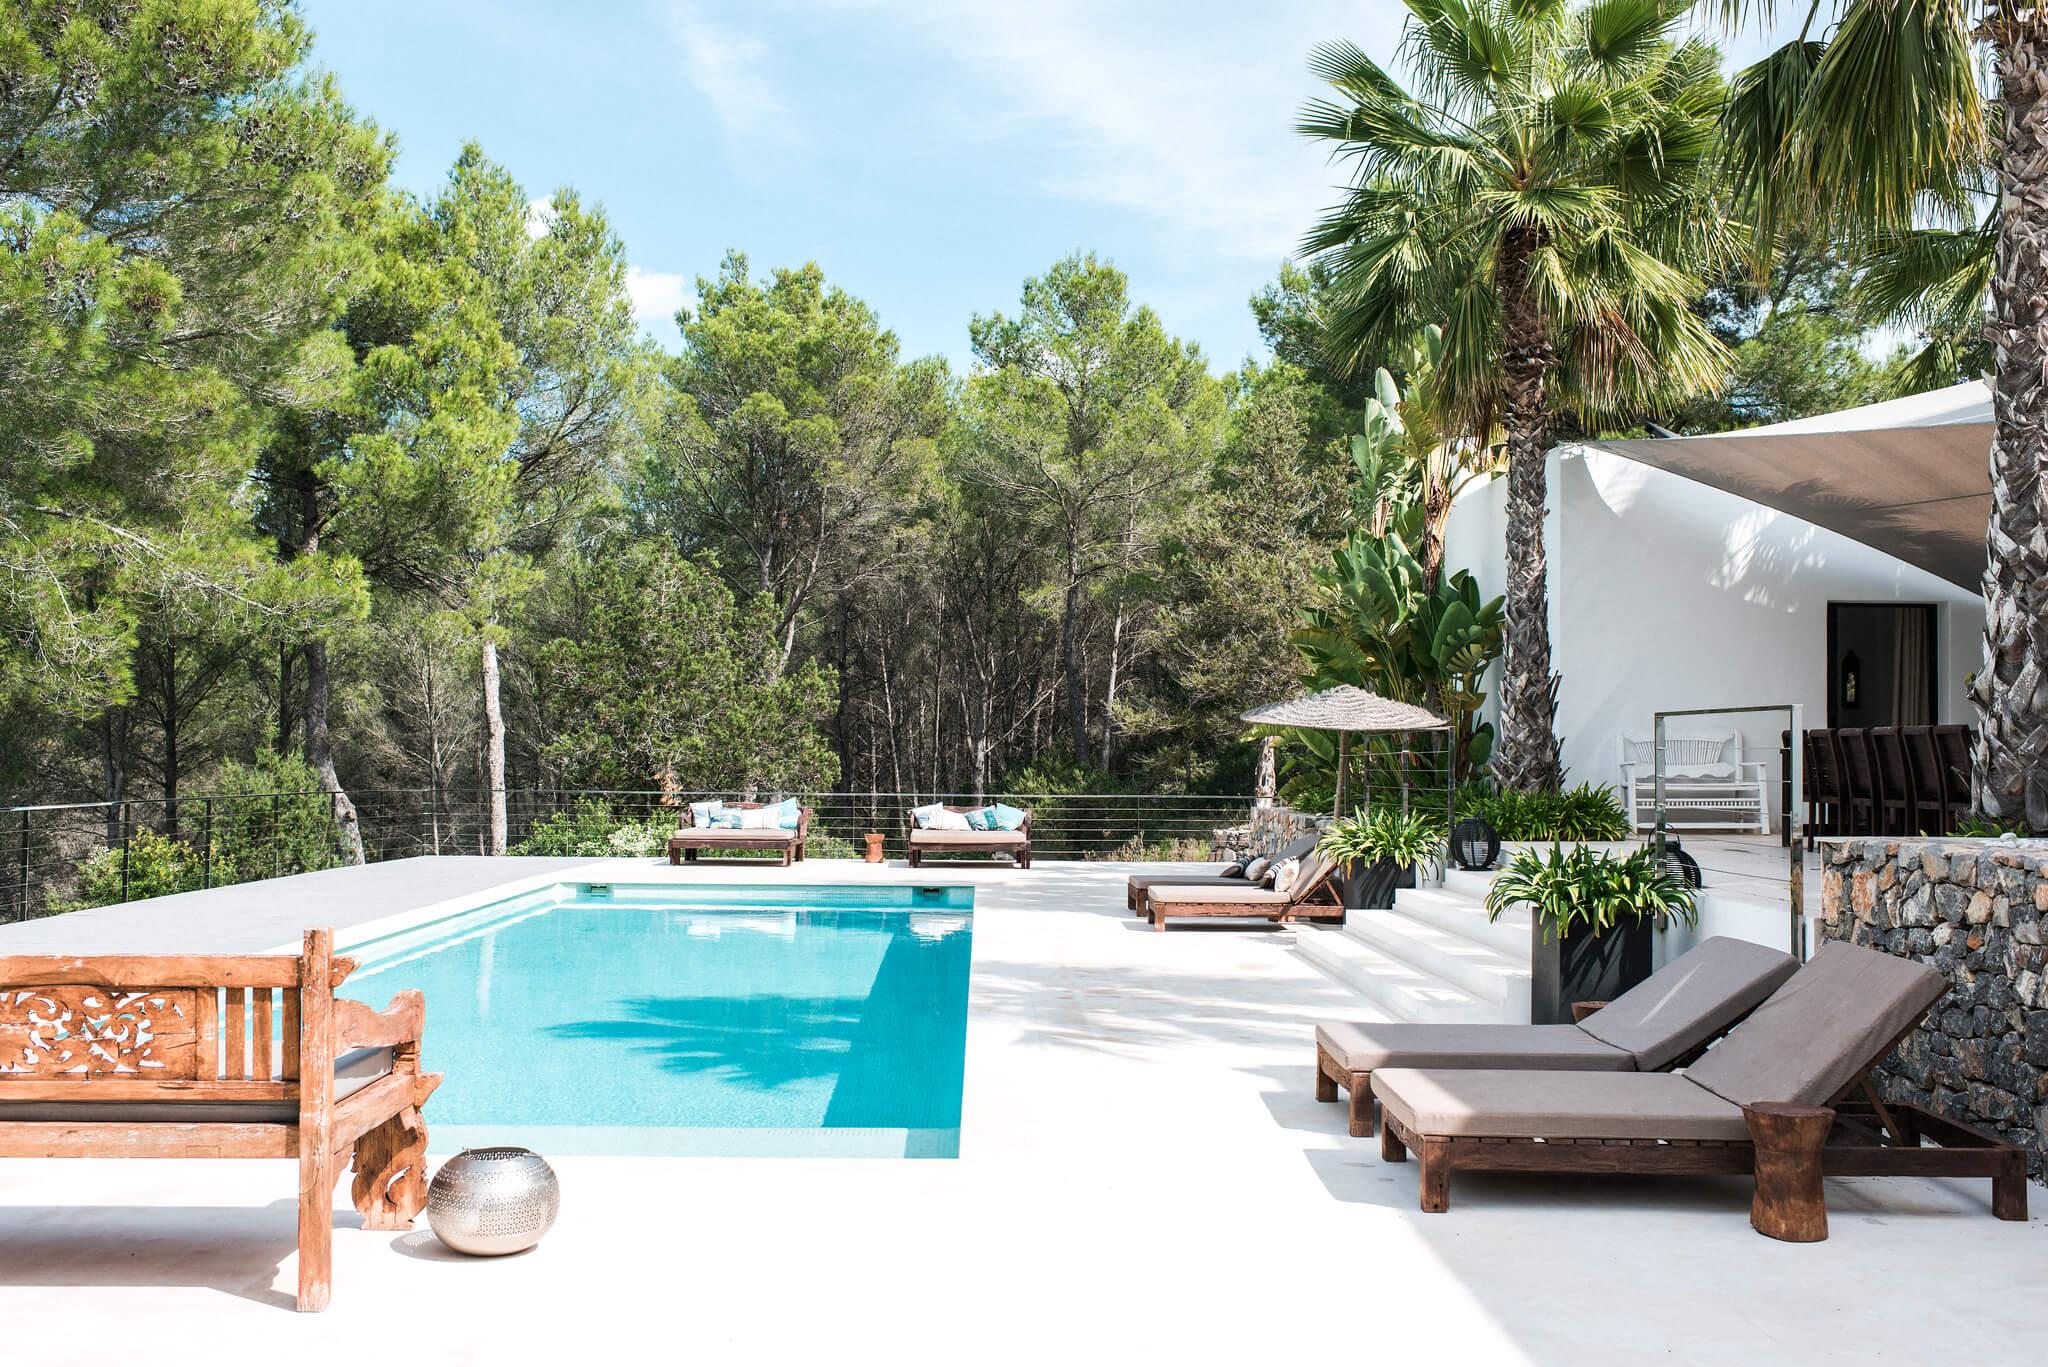 https://www.white-ibiza.com/wp-content/uploads/2020/05/white-ibiza-villas-casa-estrella-exterior-pool-1.jpg